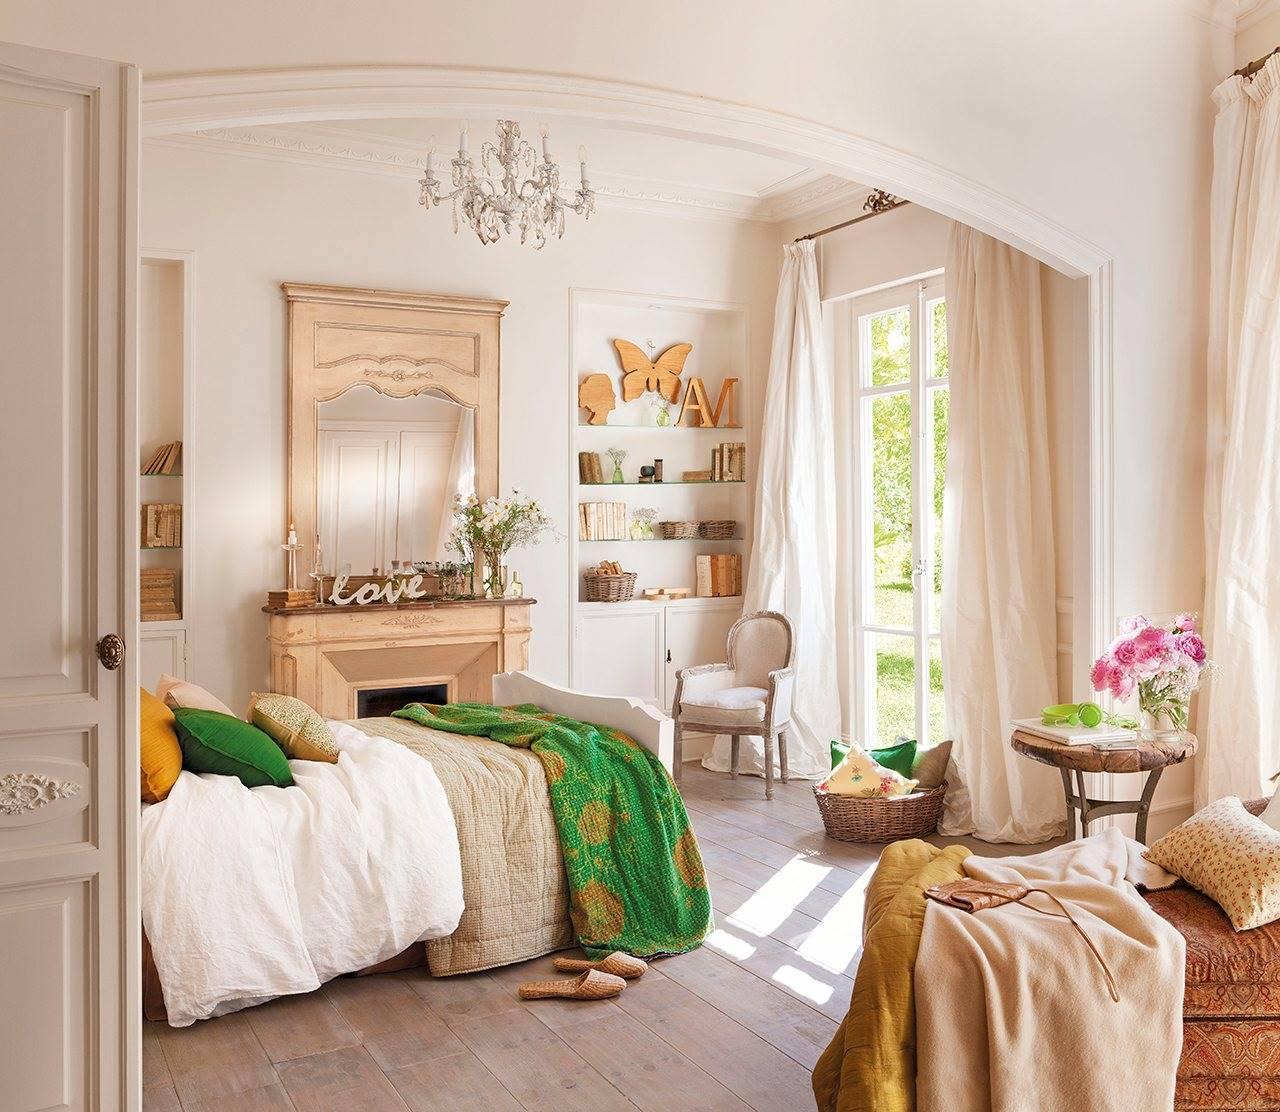 dormitorio-principal-con-chimenea-lampara-de-arana-y-balcon-al-jardin-1280x1112 435d6f45 1280x1112. Love is in the air